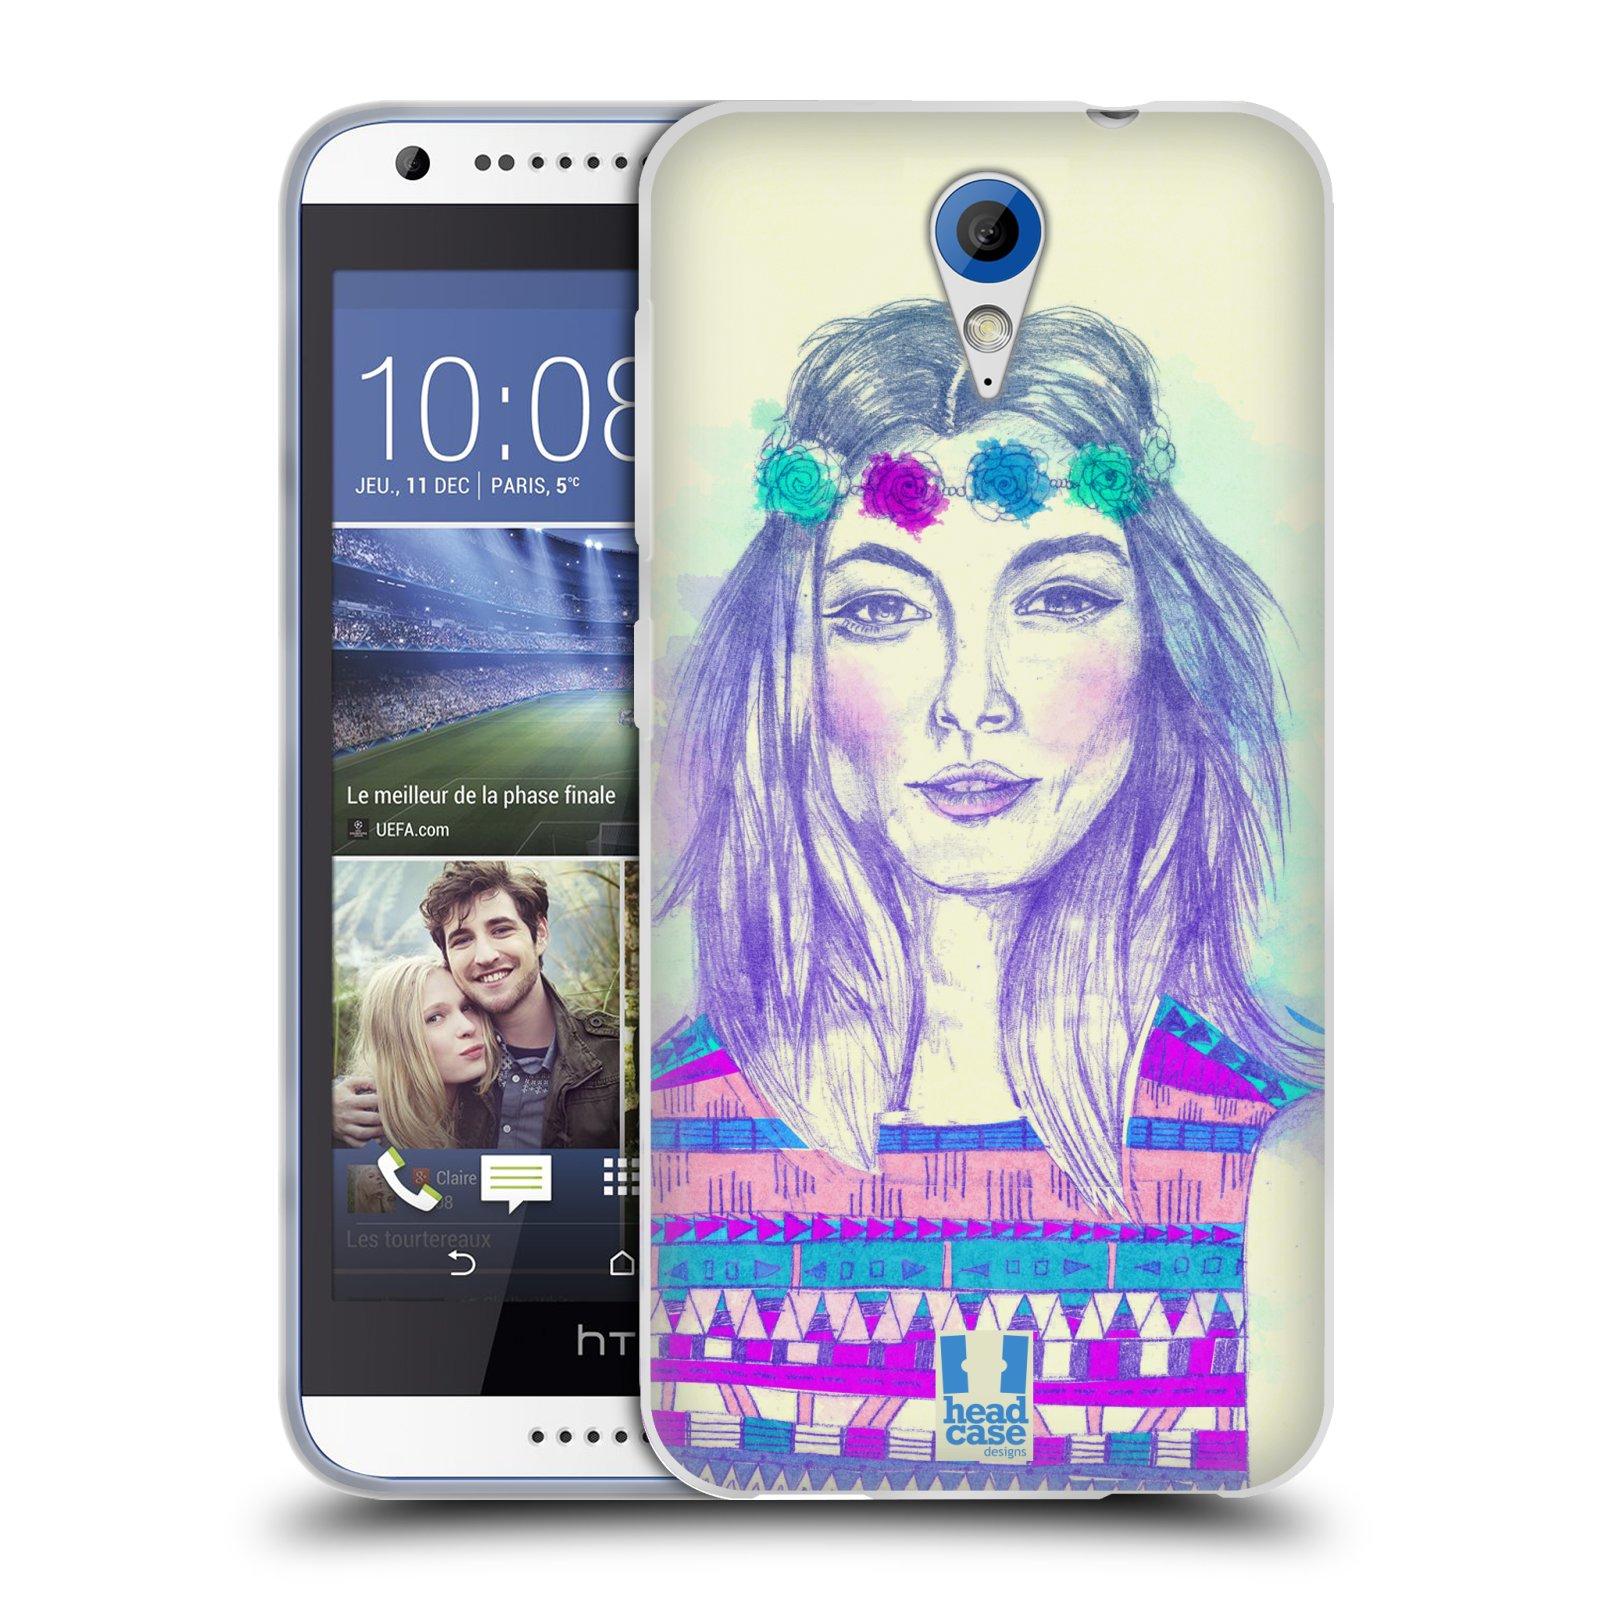 HEAD CASE silikonový obal na mobil HTC DESIRE 620 vzor Dívka dlouhé květinové vlasy HIPPIE modrá